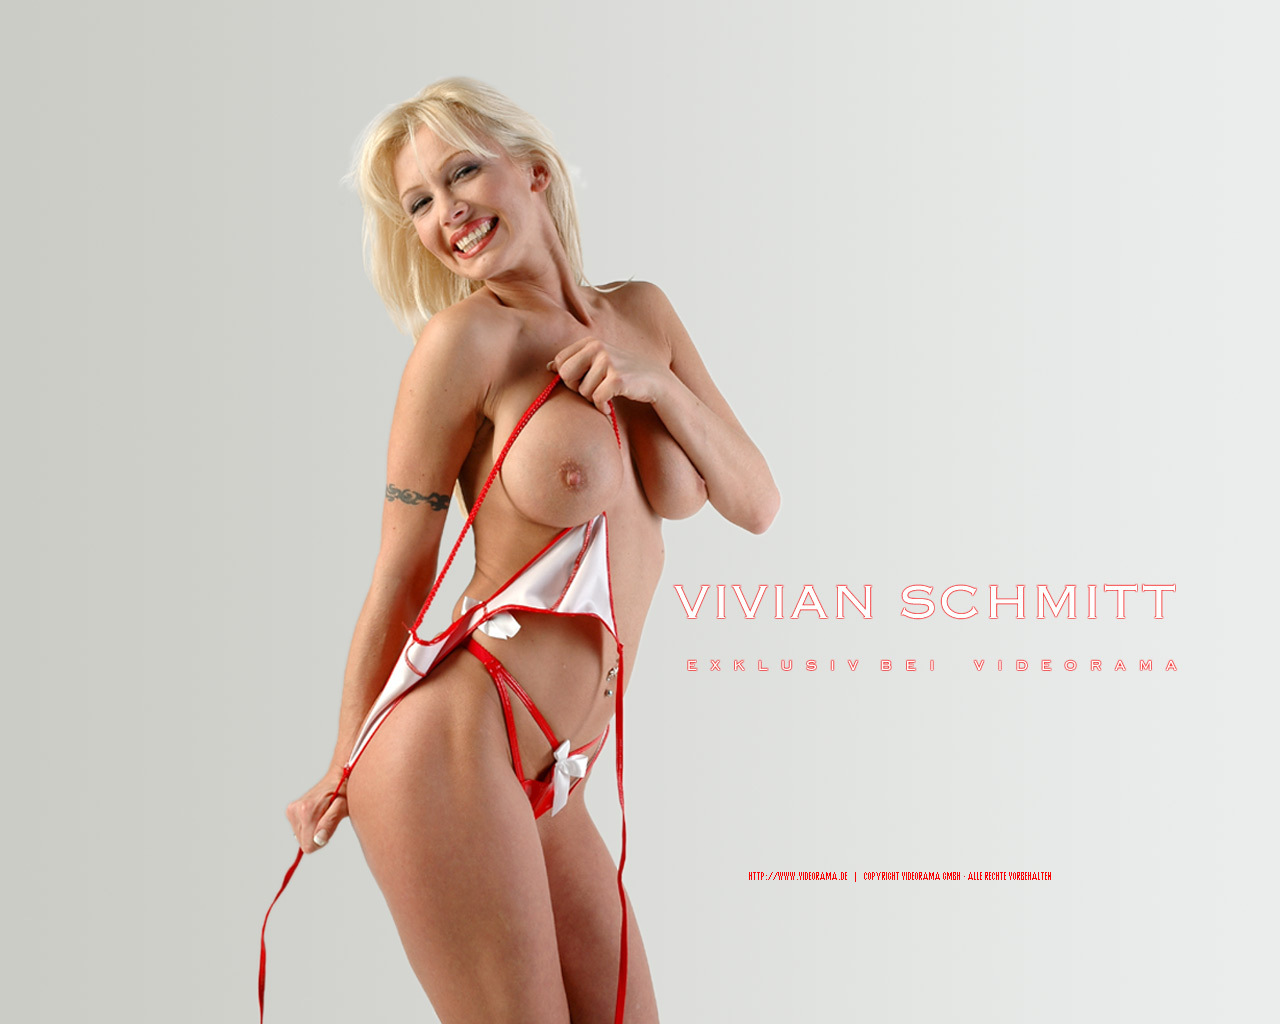 Vivian Schmitt Homepage